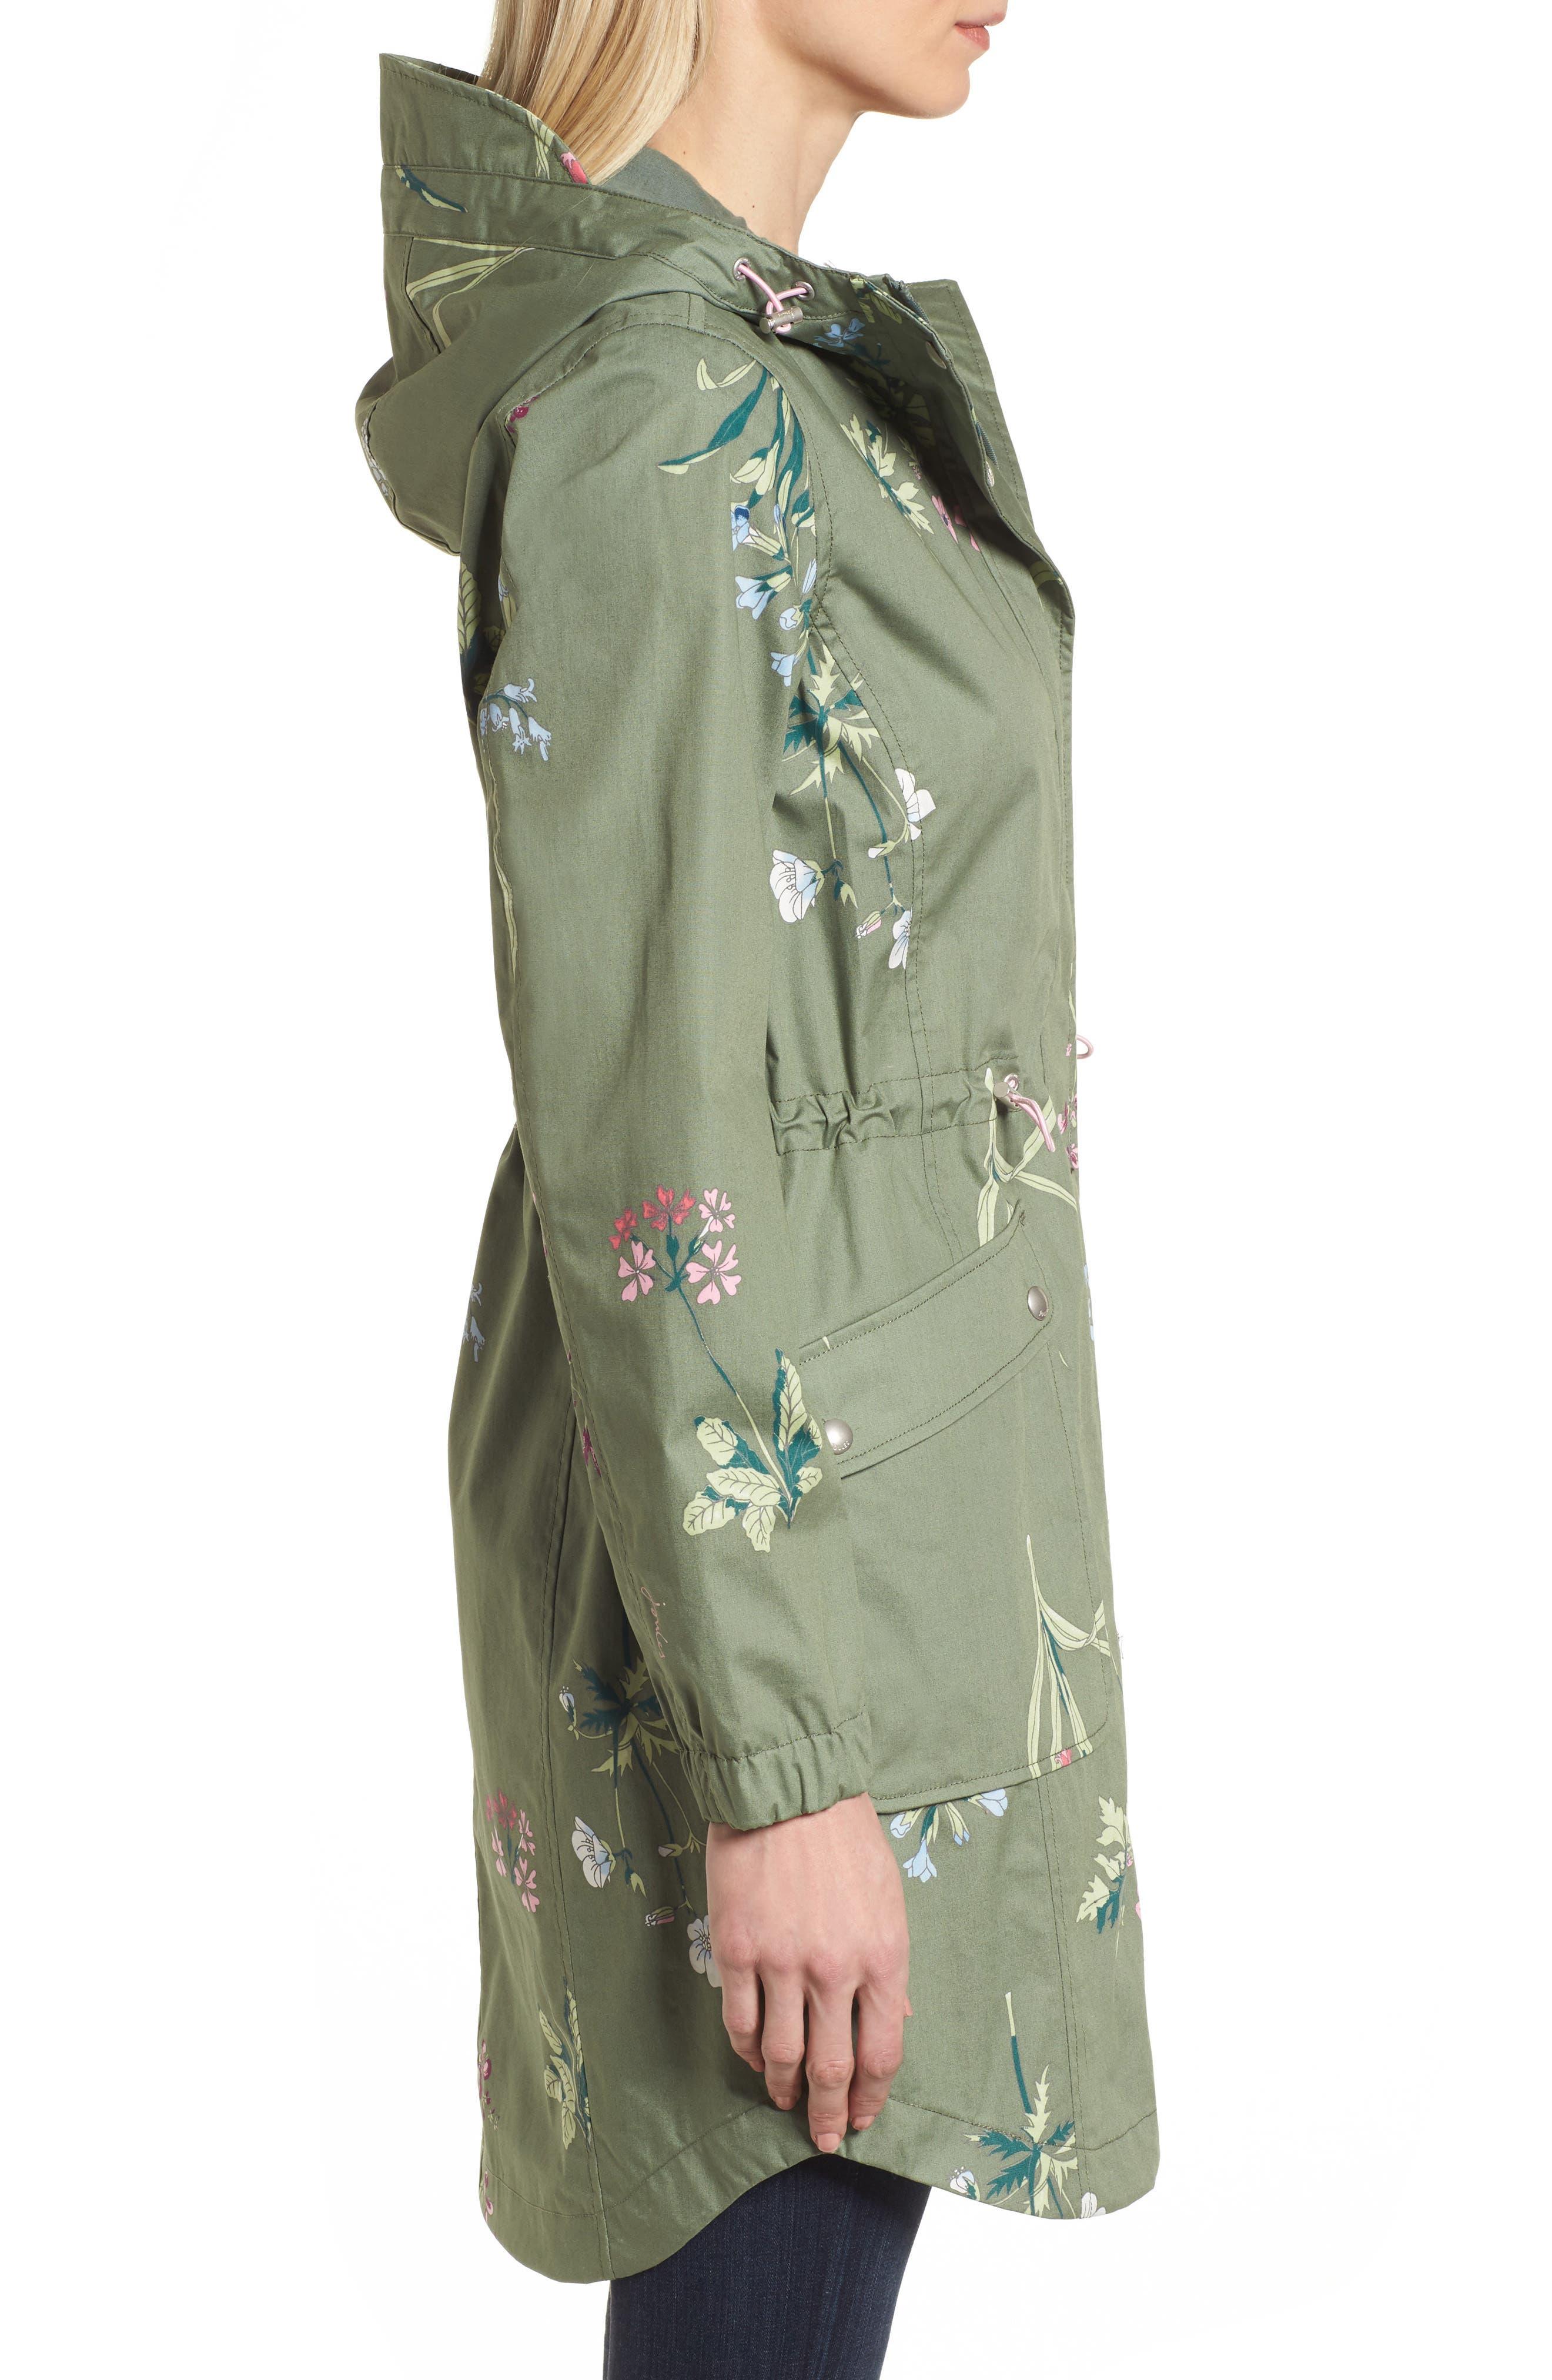 Right as Rain - Coastline Waterproof Cotton Jacket,                             Alternate thumbnail 3, color,                             Laurel Botanical